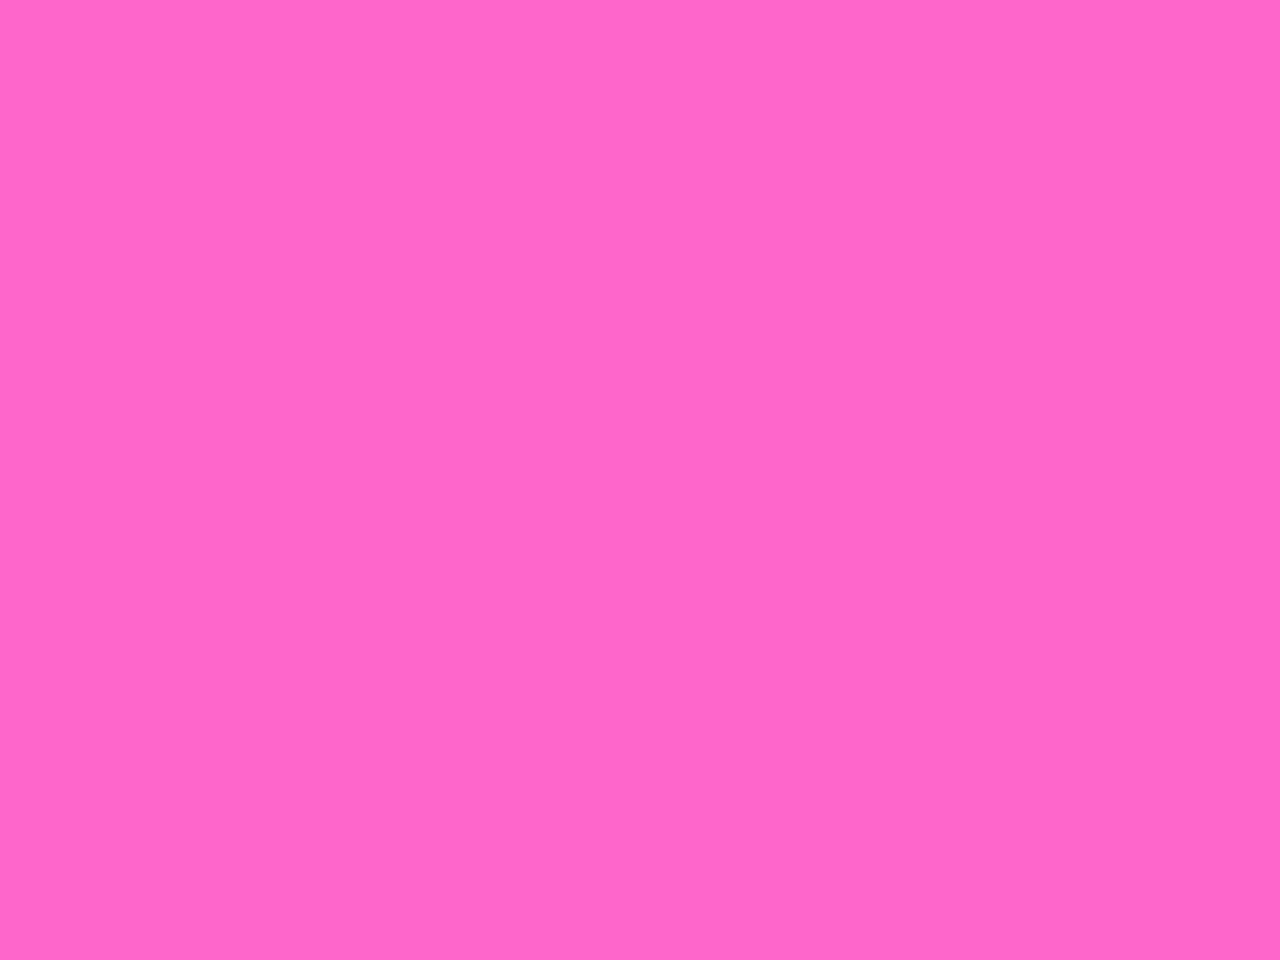 1280x960 Rose Pink Solid Color Background